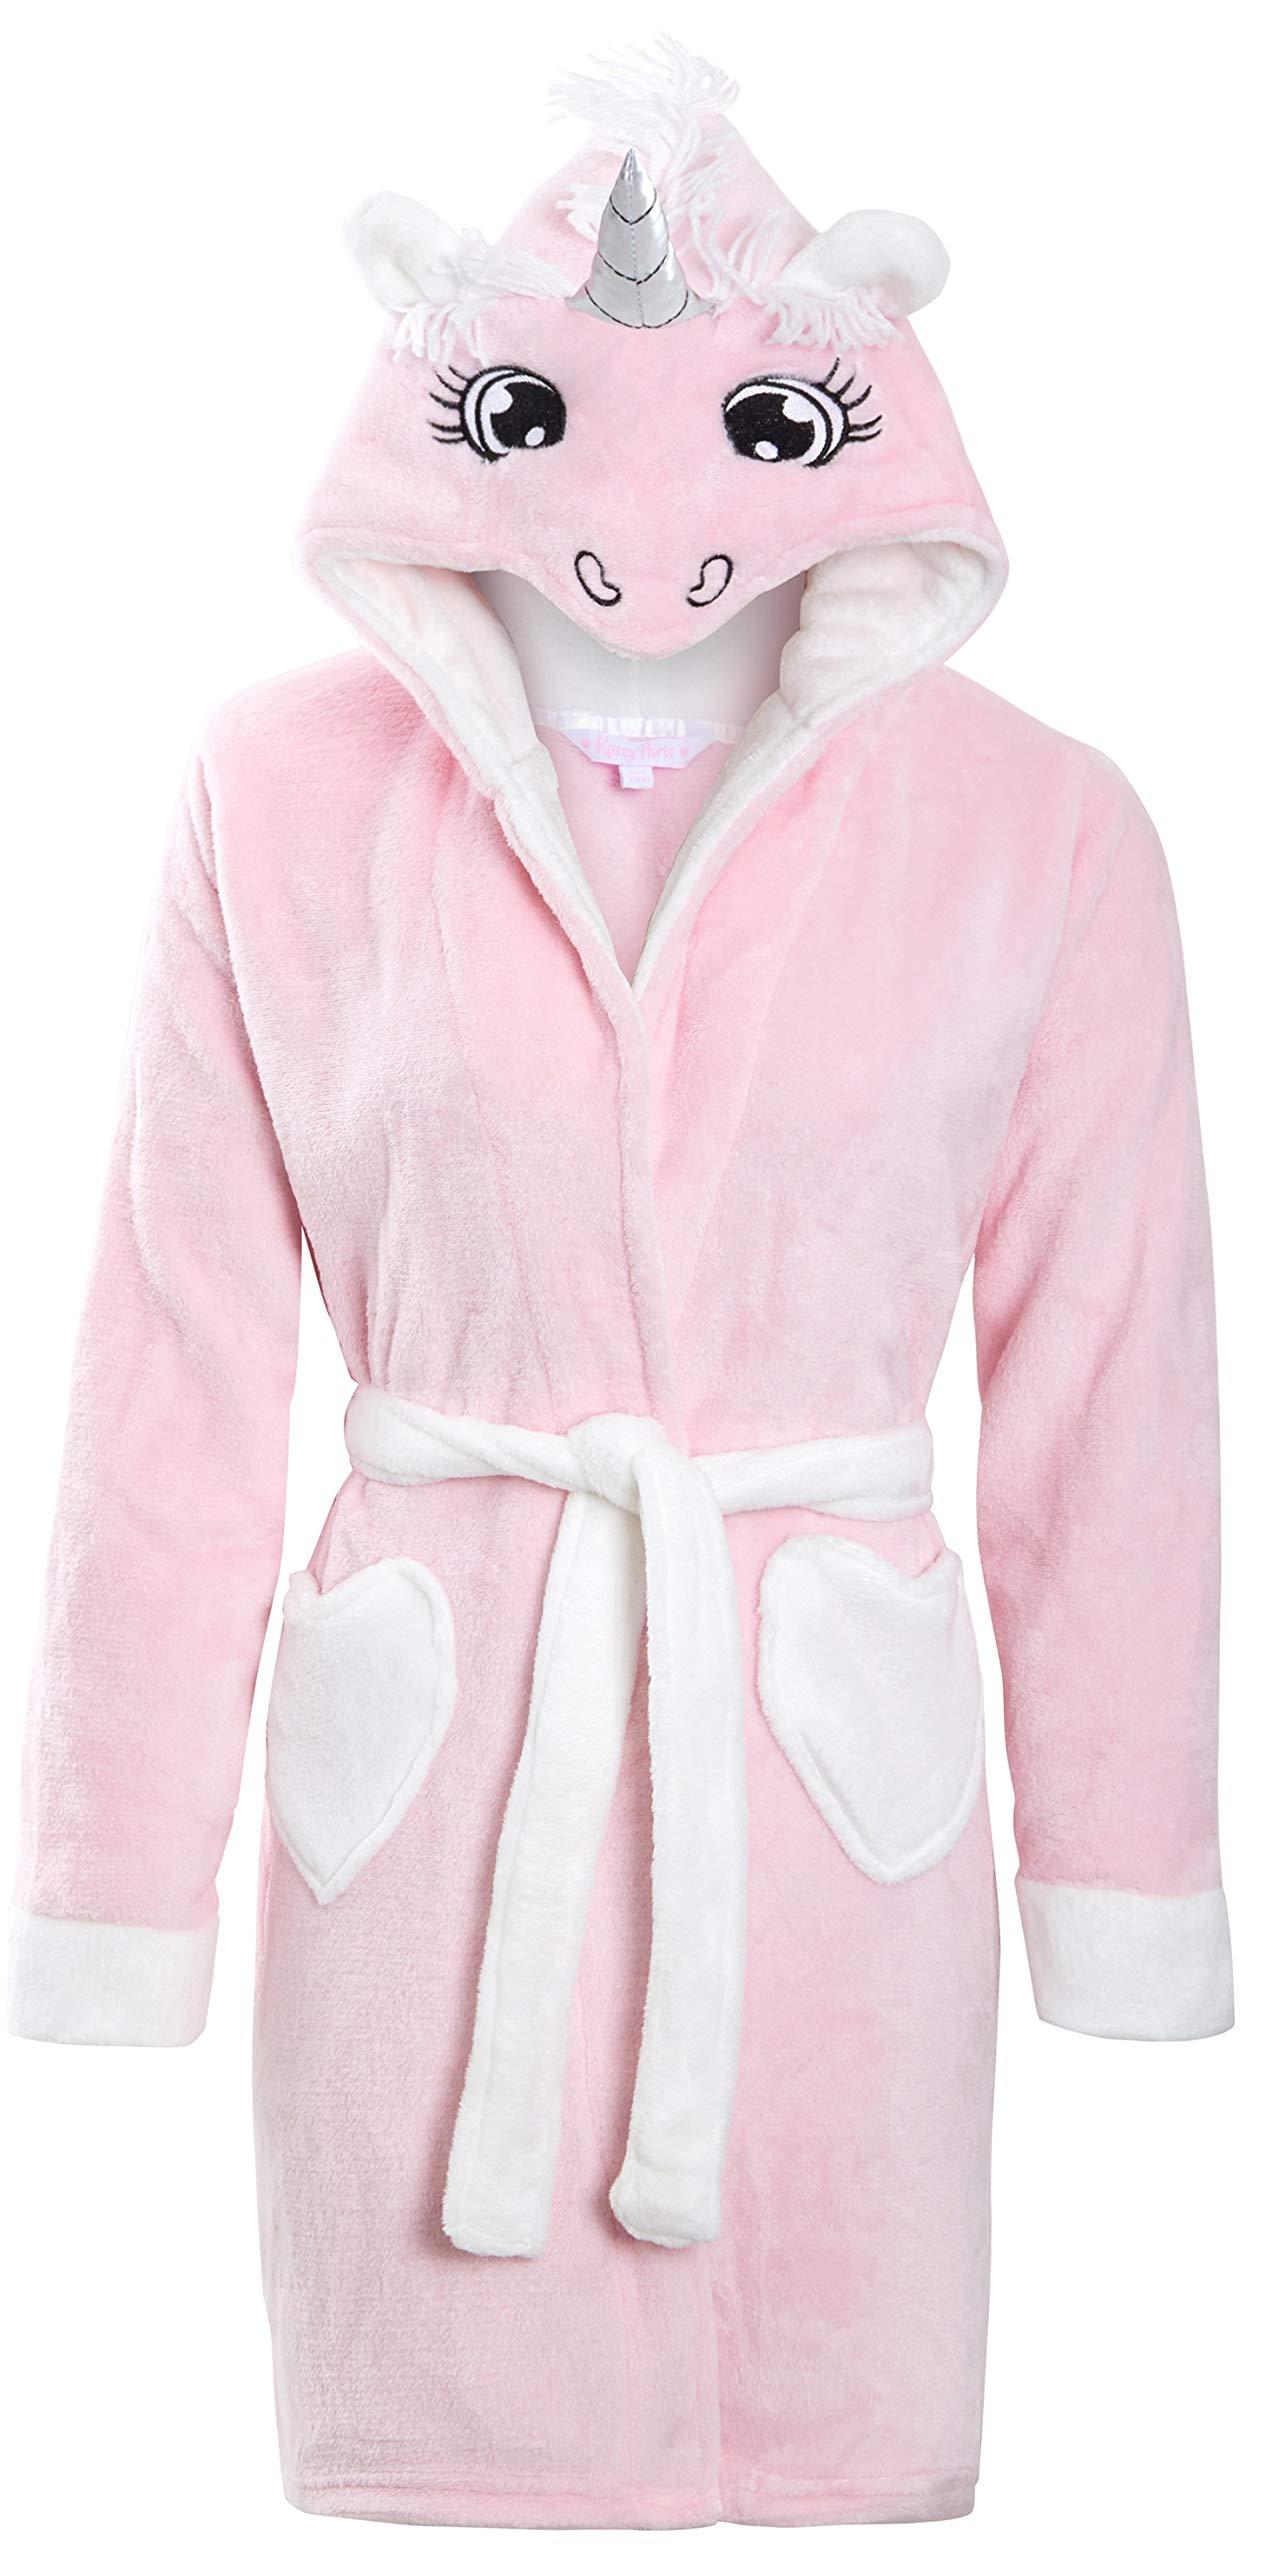 Metzuyan Girls Plush Fleece Hooded Unicorn Robe Tail